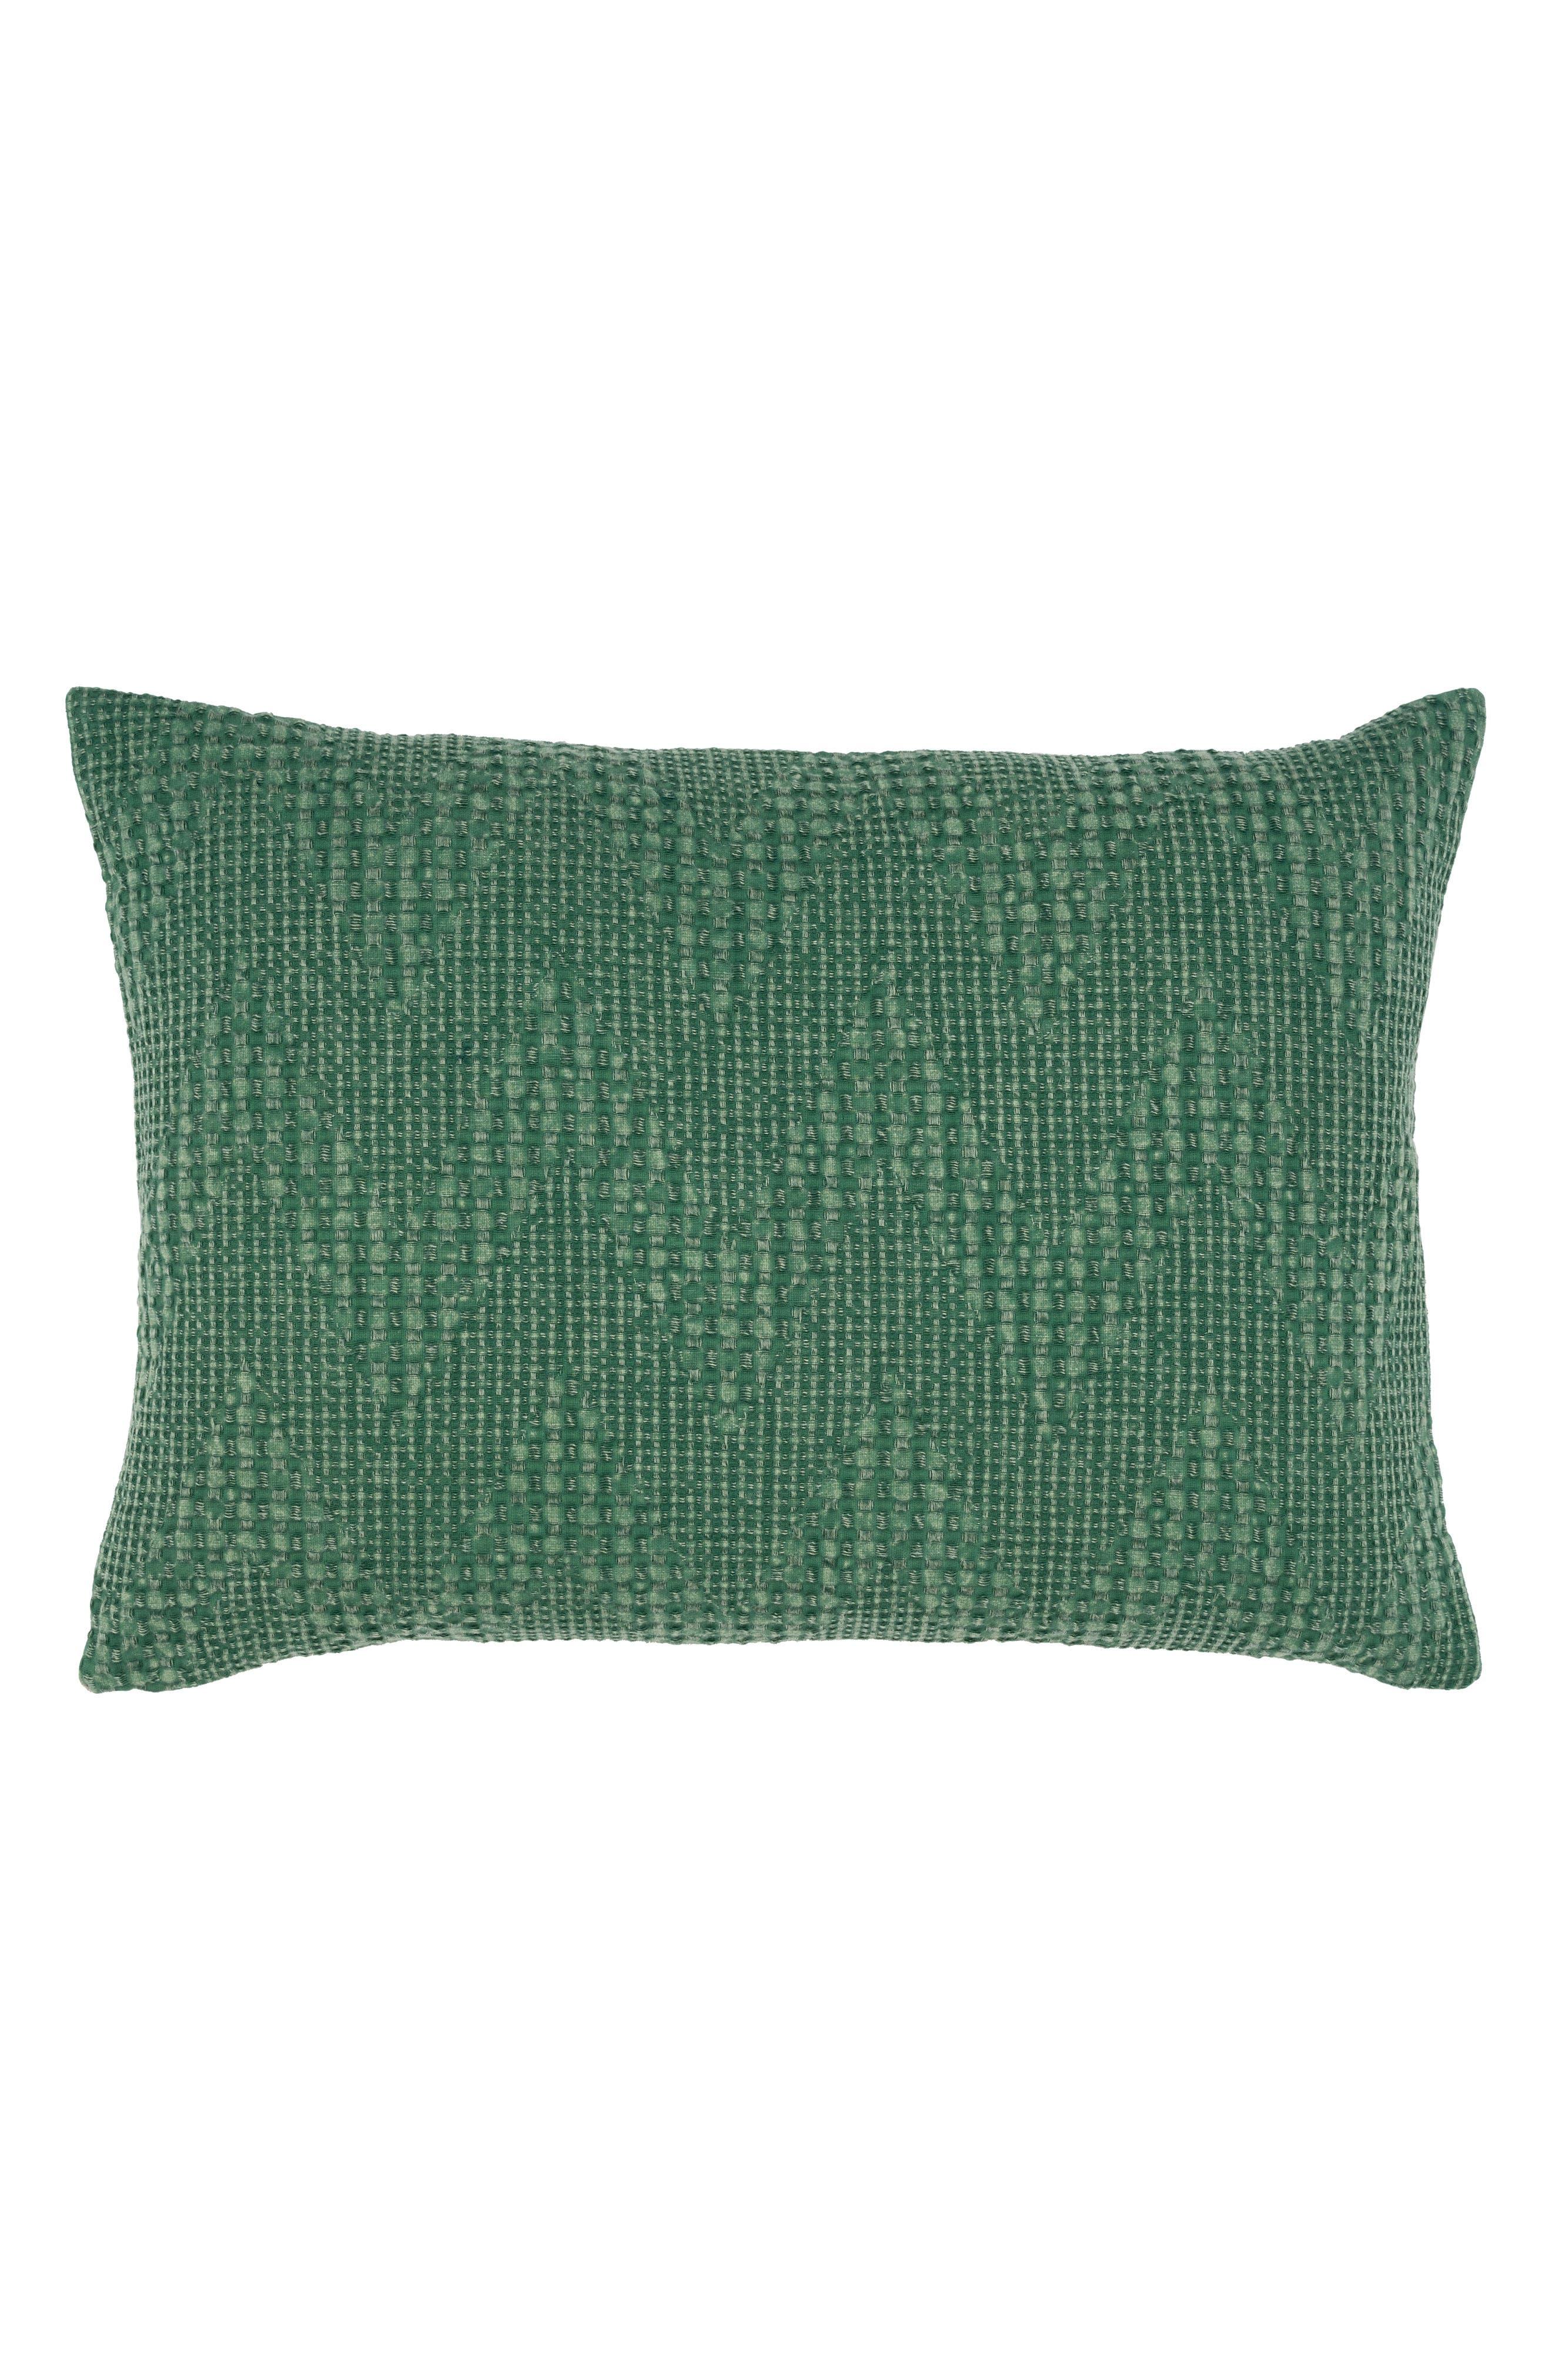 Fabiana Accent Pillow,                             Main thumbnail 1, color,                             GREEN